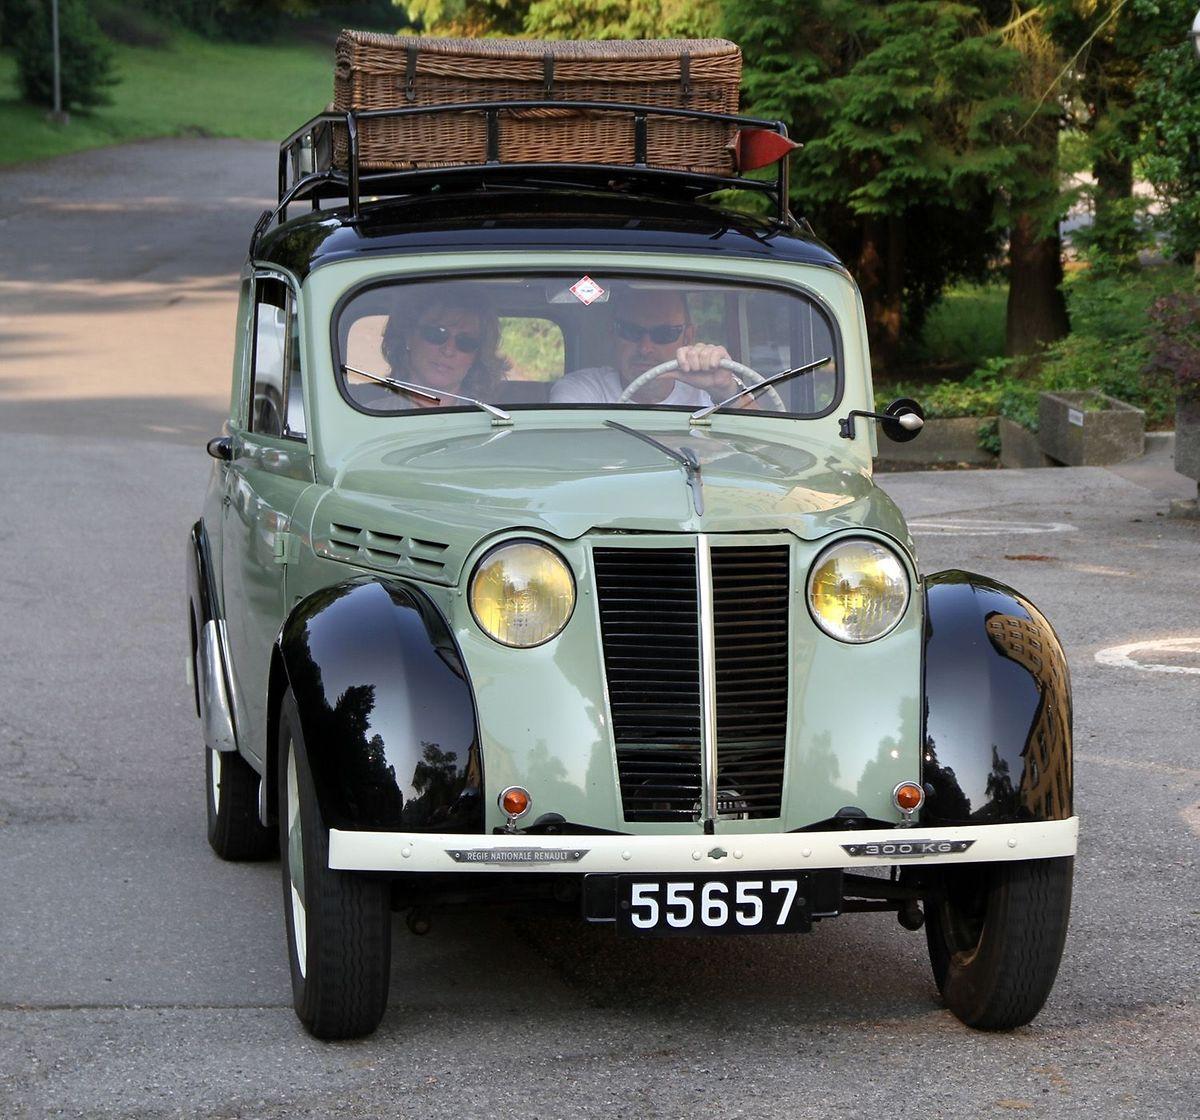 Vintage cars need valid registration sticker but no CT Photo: Charlot Kuhn